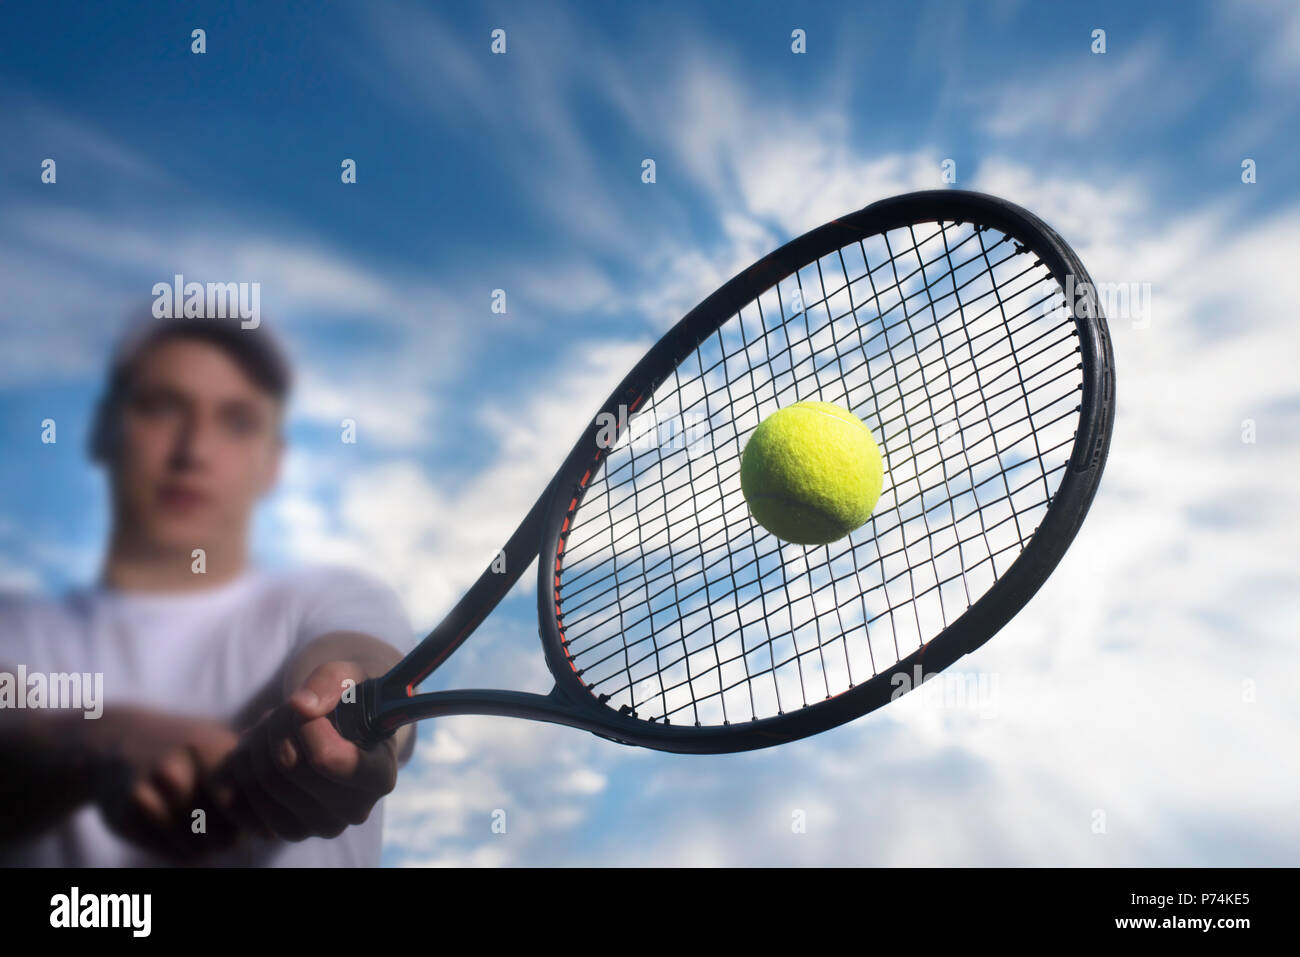 Tennis player hitting ball with backhand - Stock Image